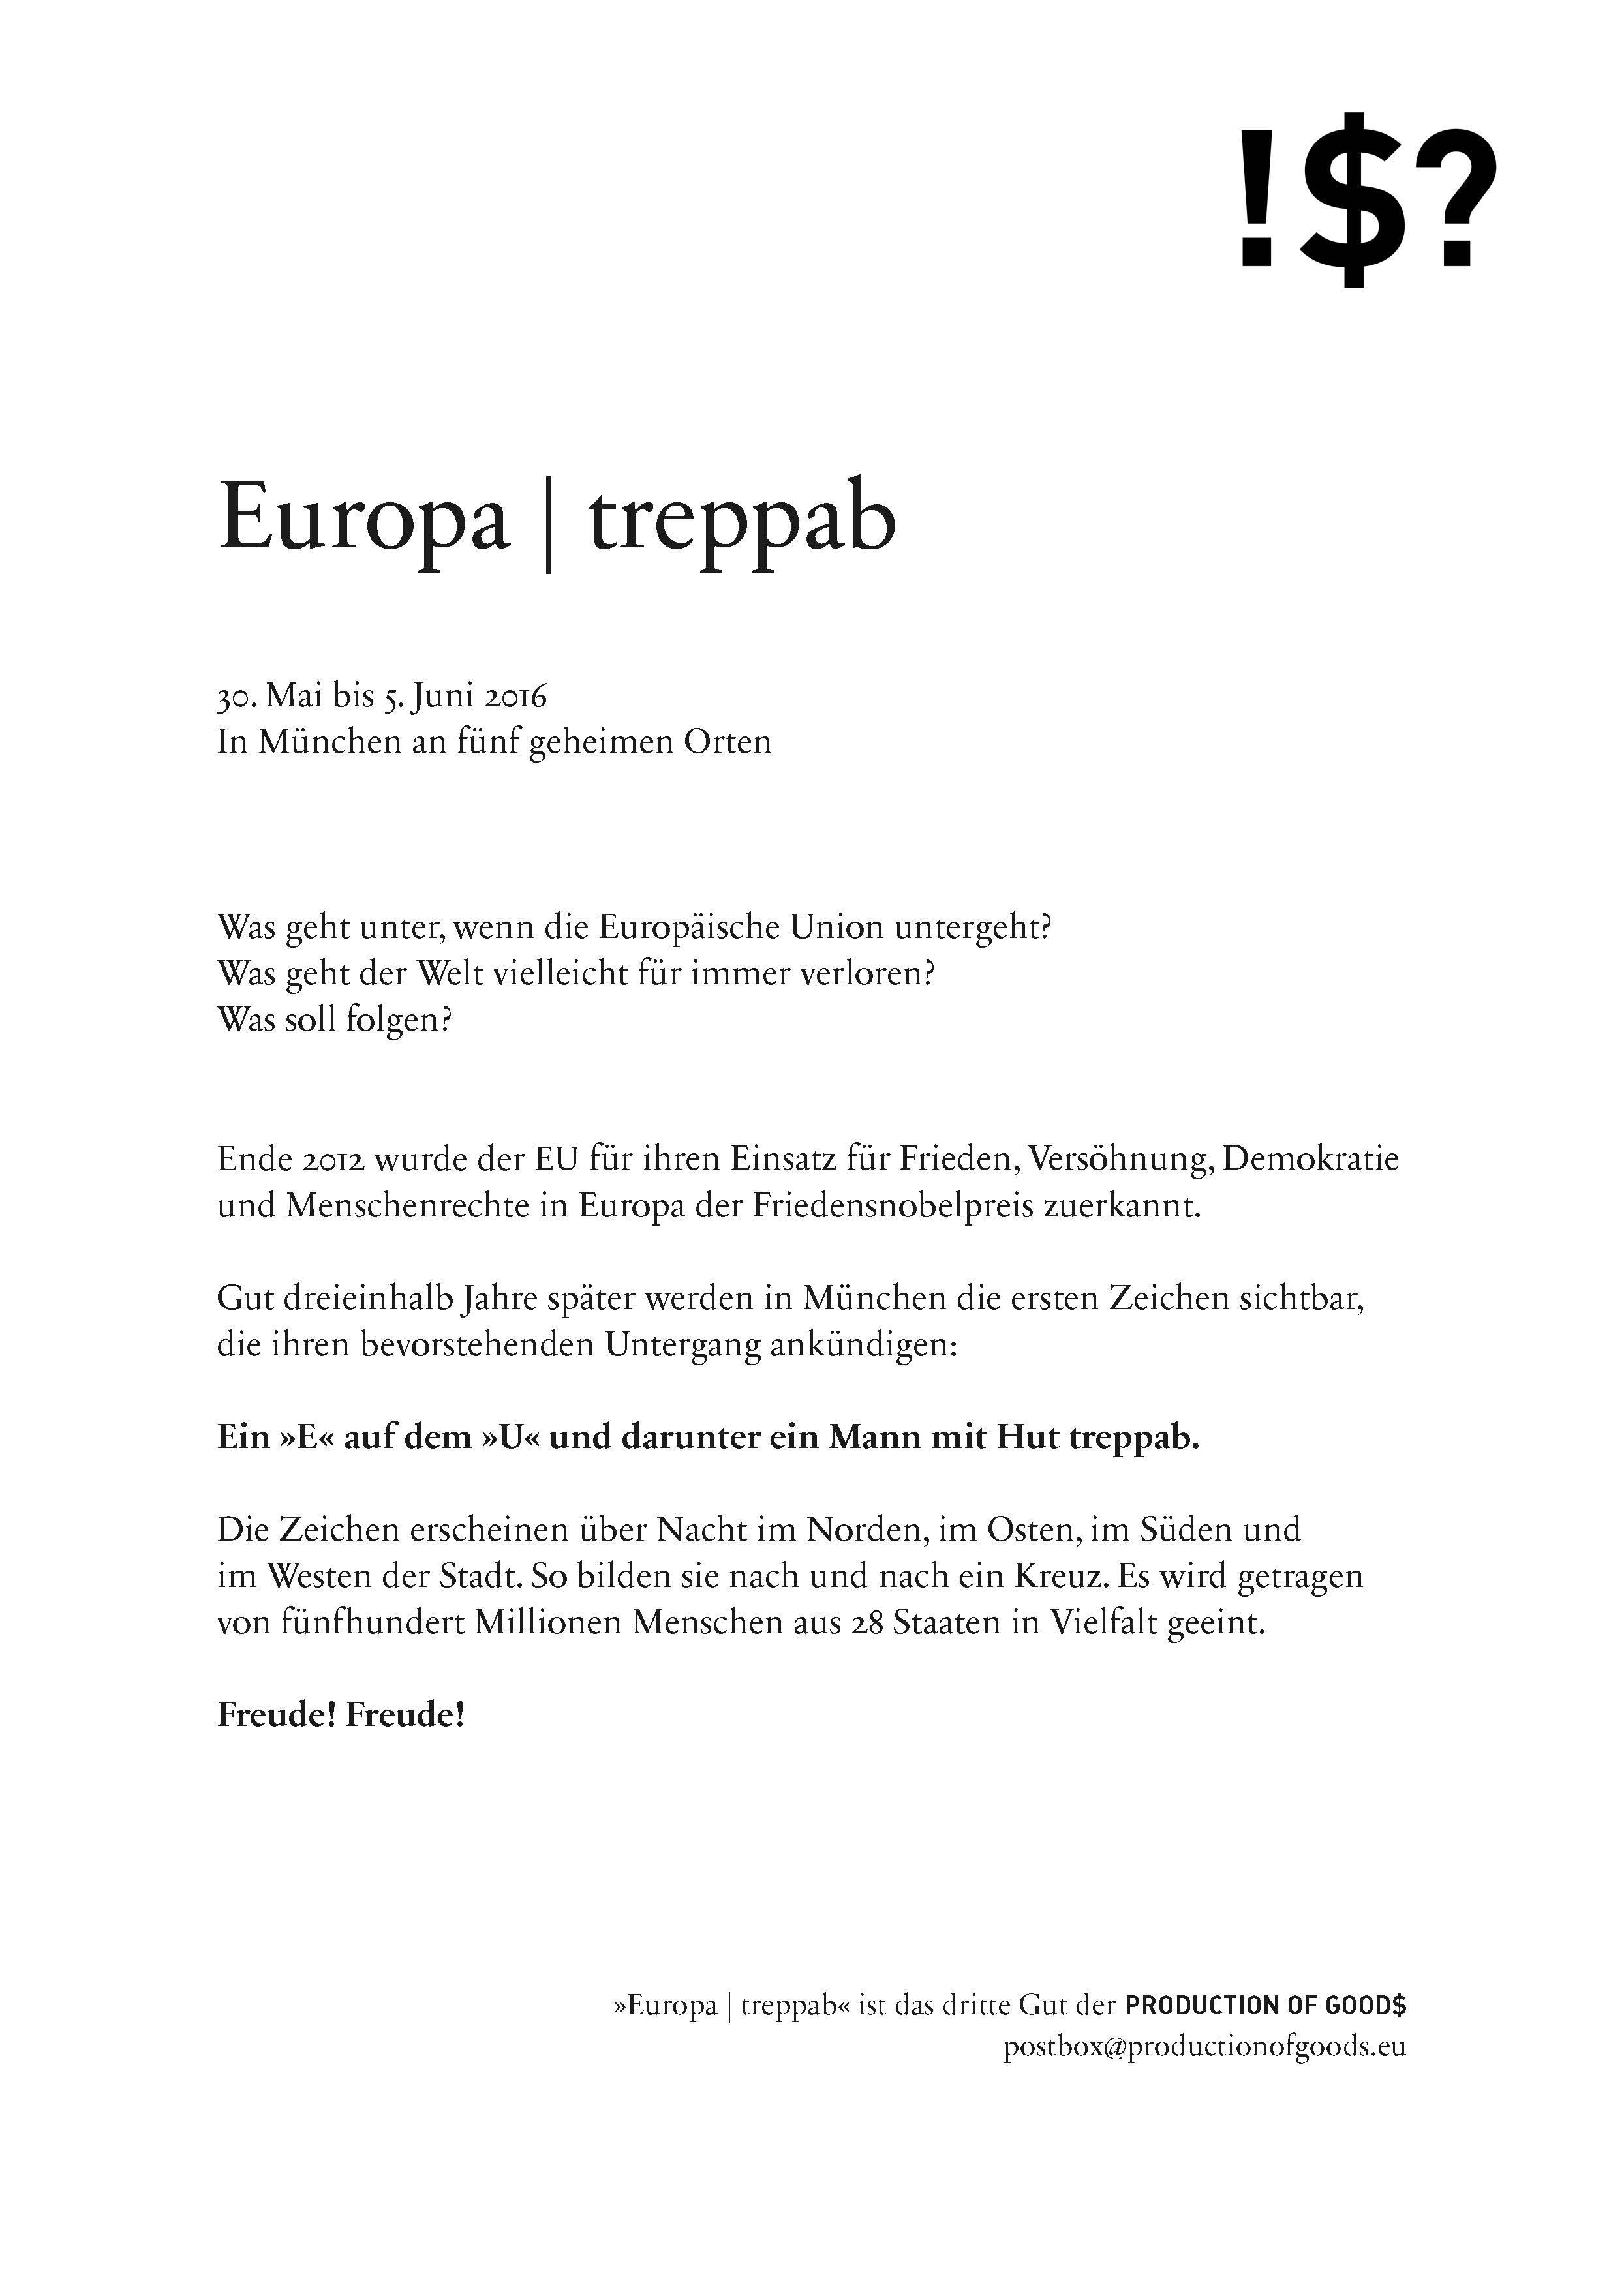 Flugblatt_Europa_treppab_ml